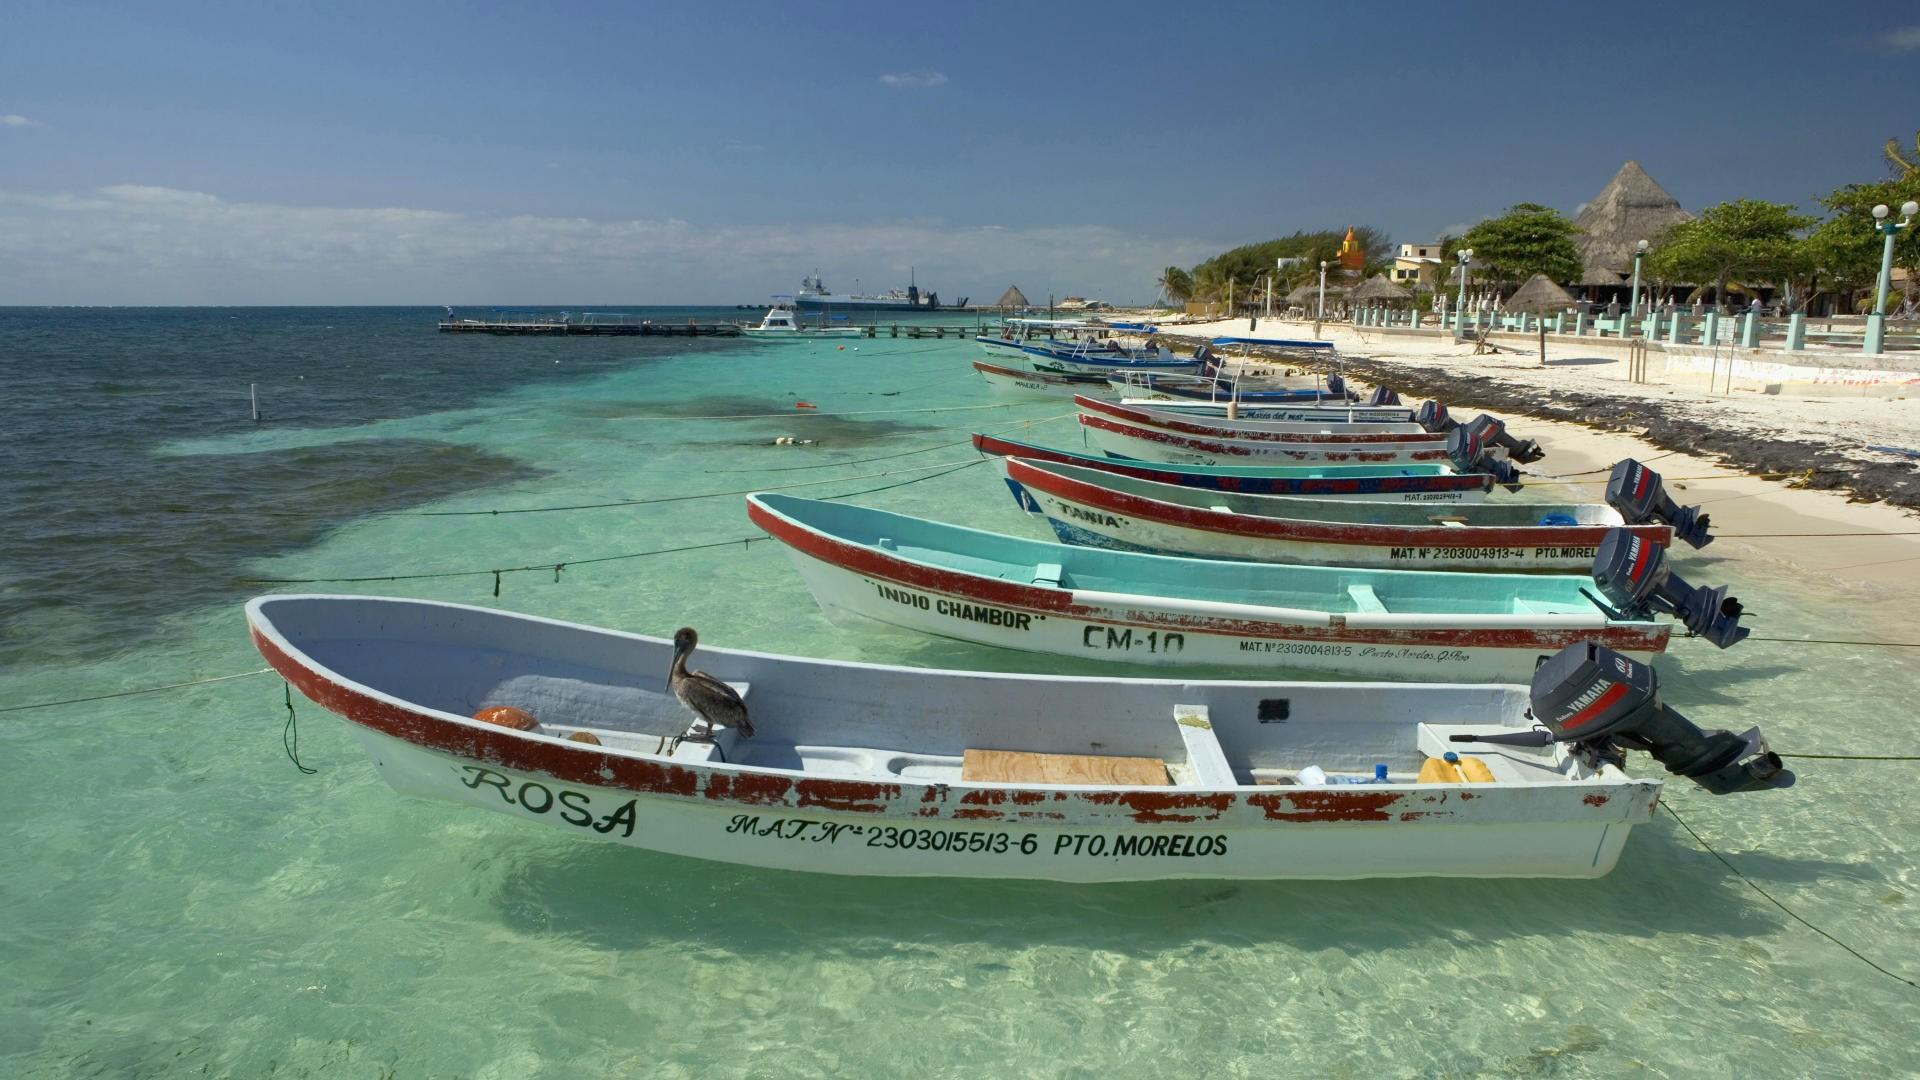 Mexico Boats Wallpaper 1920x1080 Mexico Boats Fishing Vehicles 1920x1080